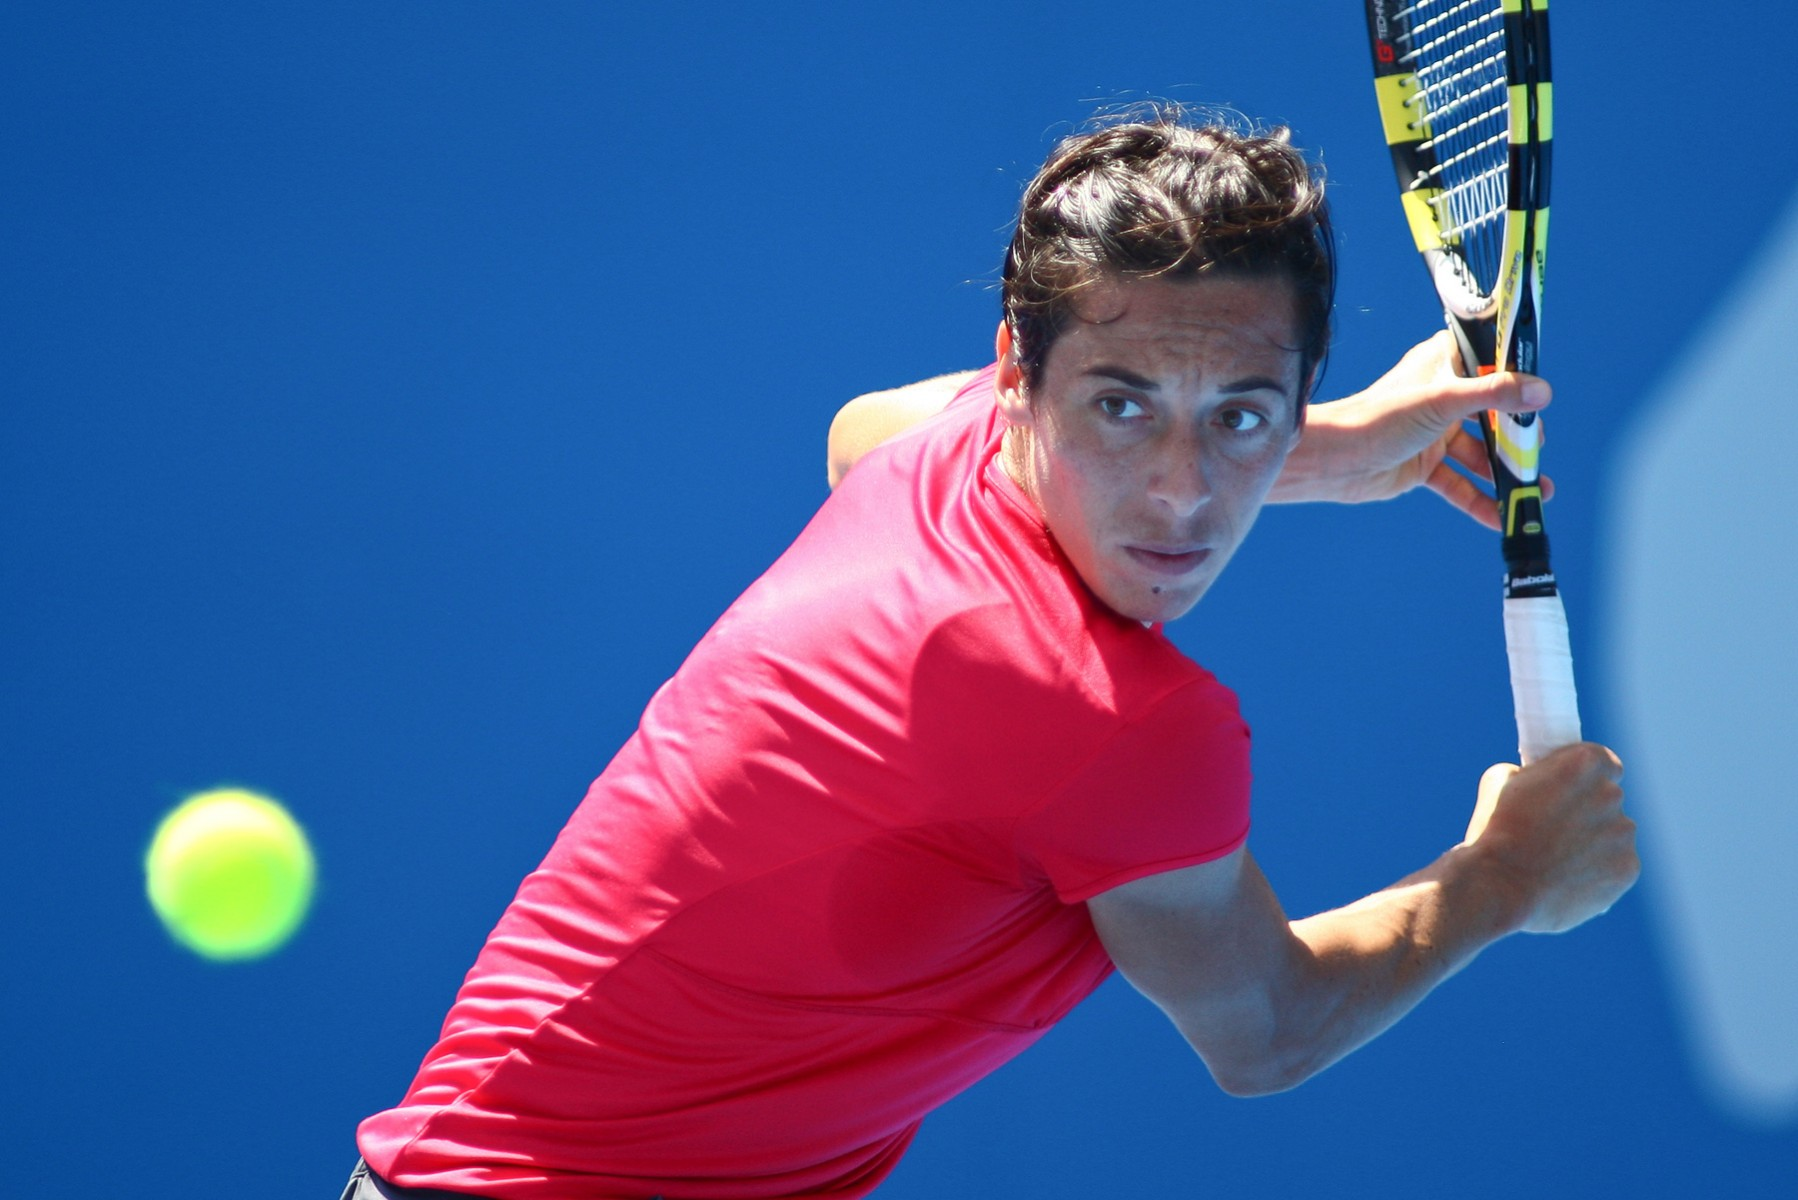 Tennis. Meteo folle e infortuni ora l'Australian Open fa paura